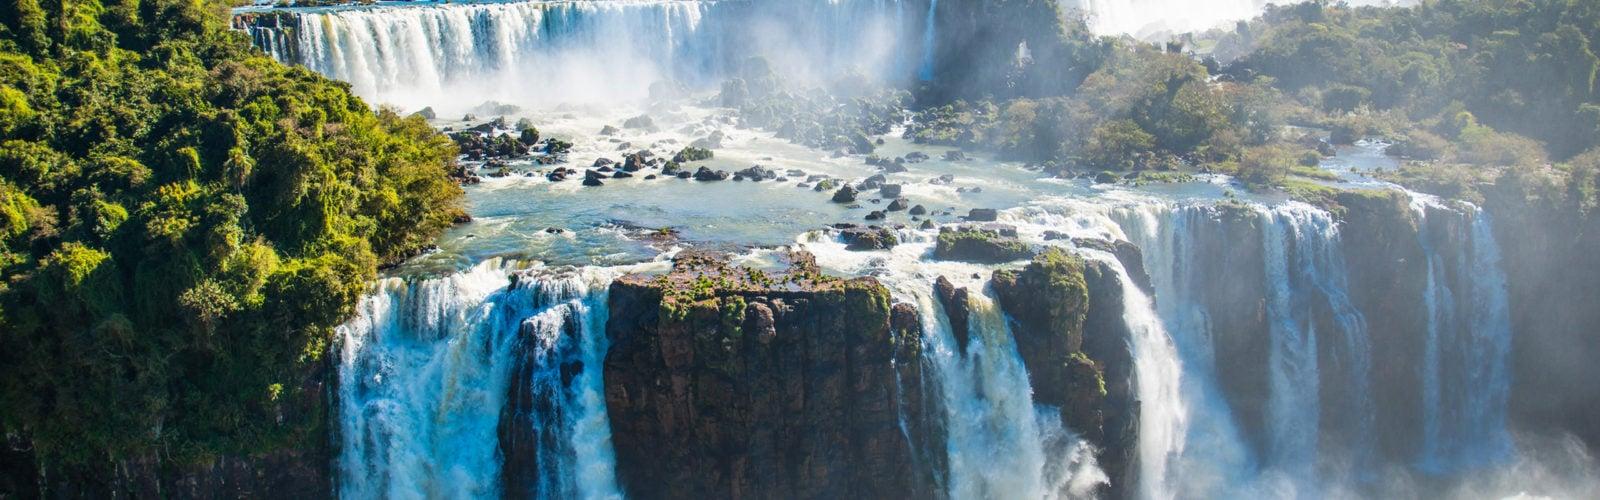 Iguazu Falls Argentina Tourist Attractions